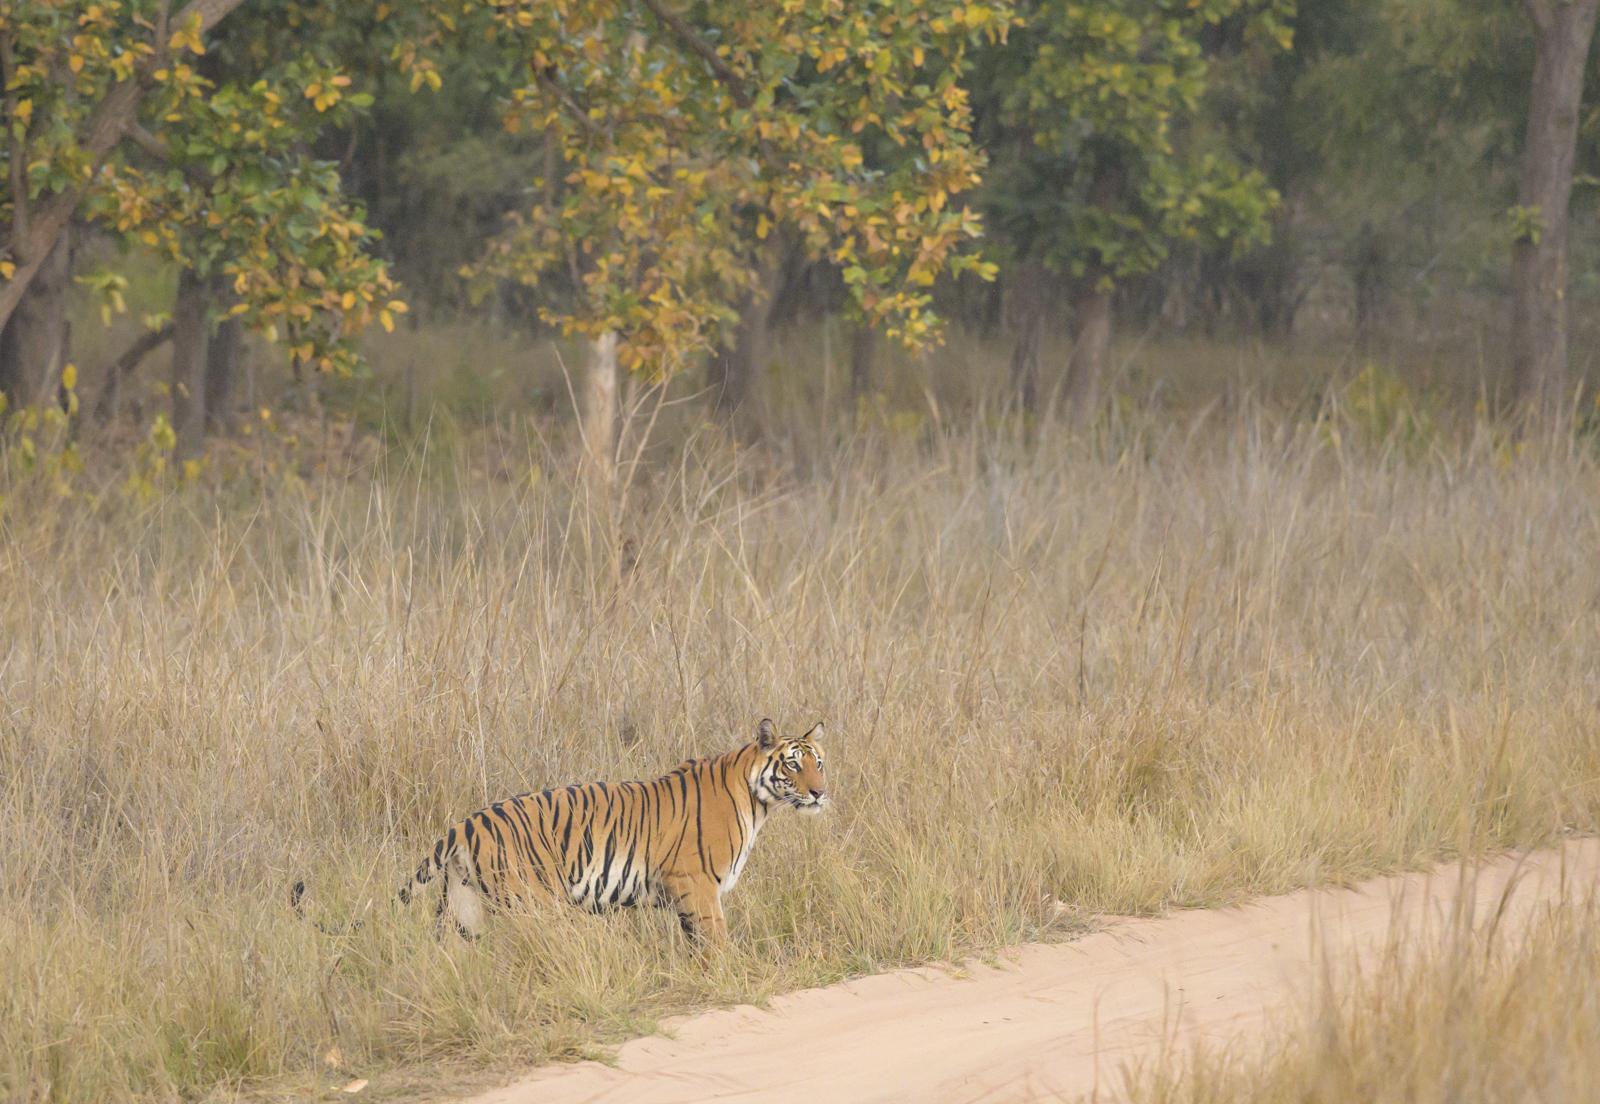 3-Wild tigers of india